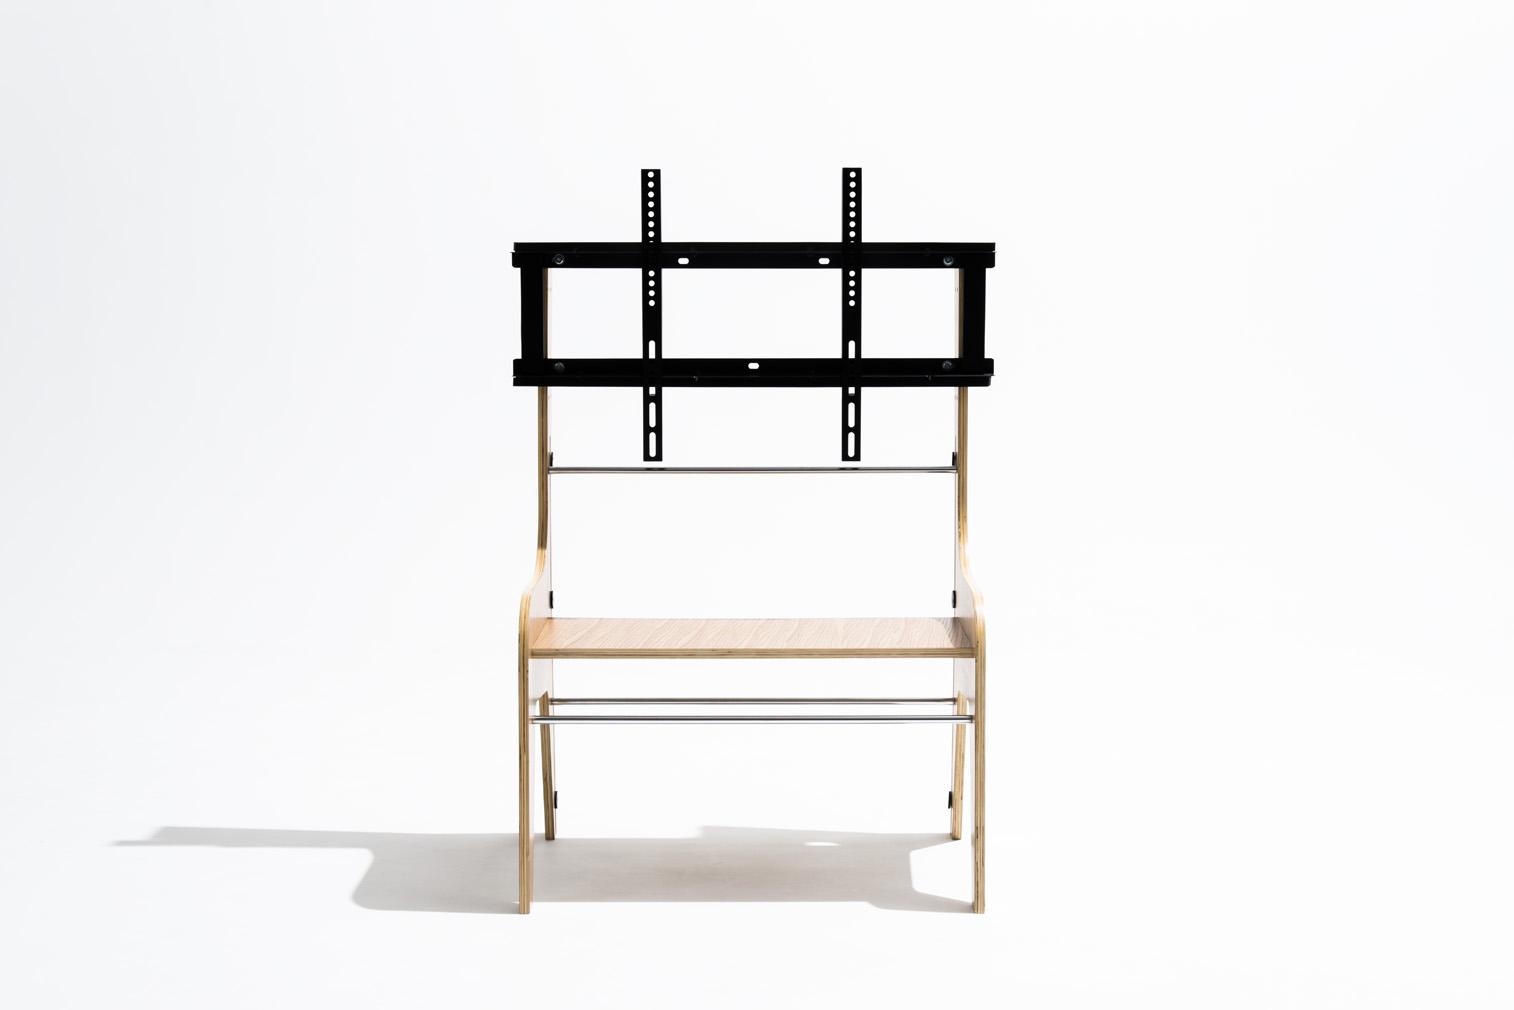 wood-TV-stand-FSW-zeitgeist-midcentury-modern-design-wTV-naked-front